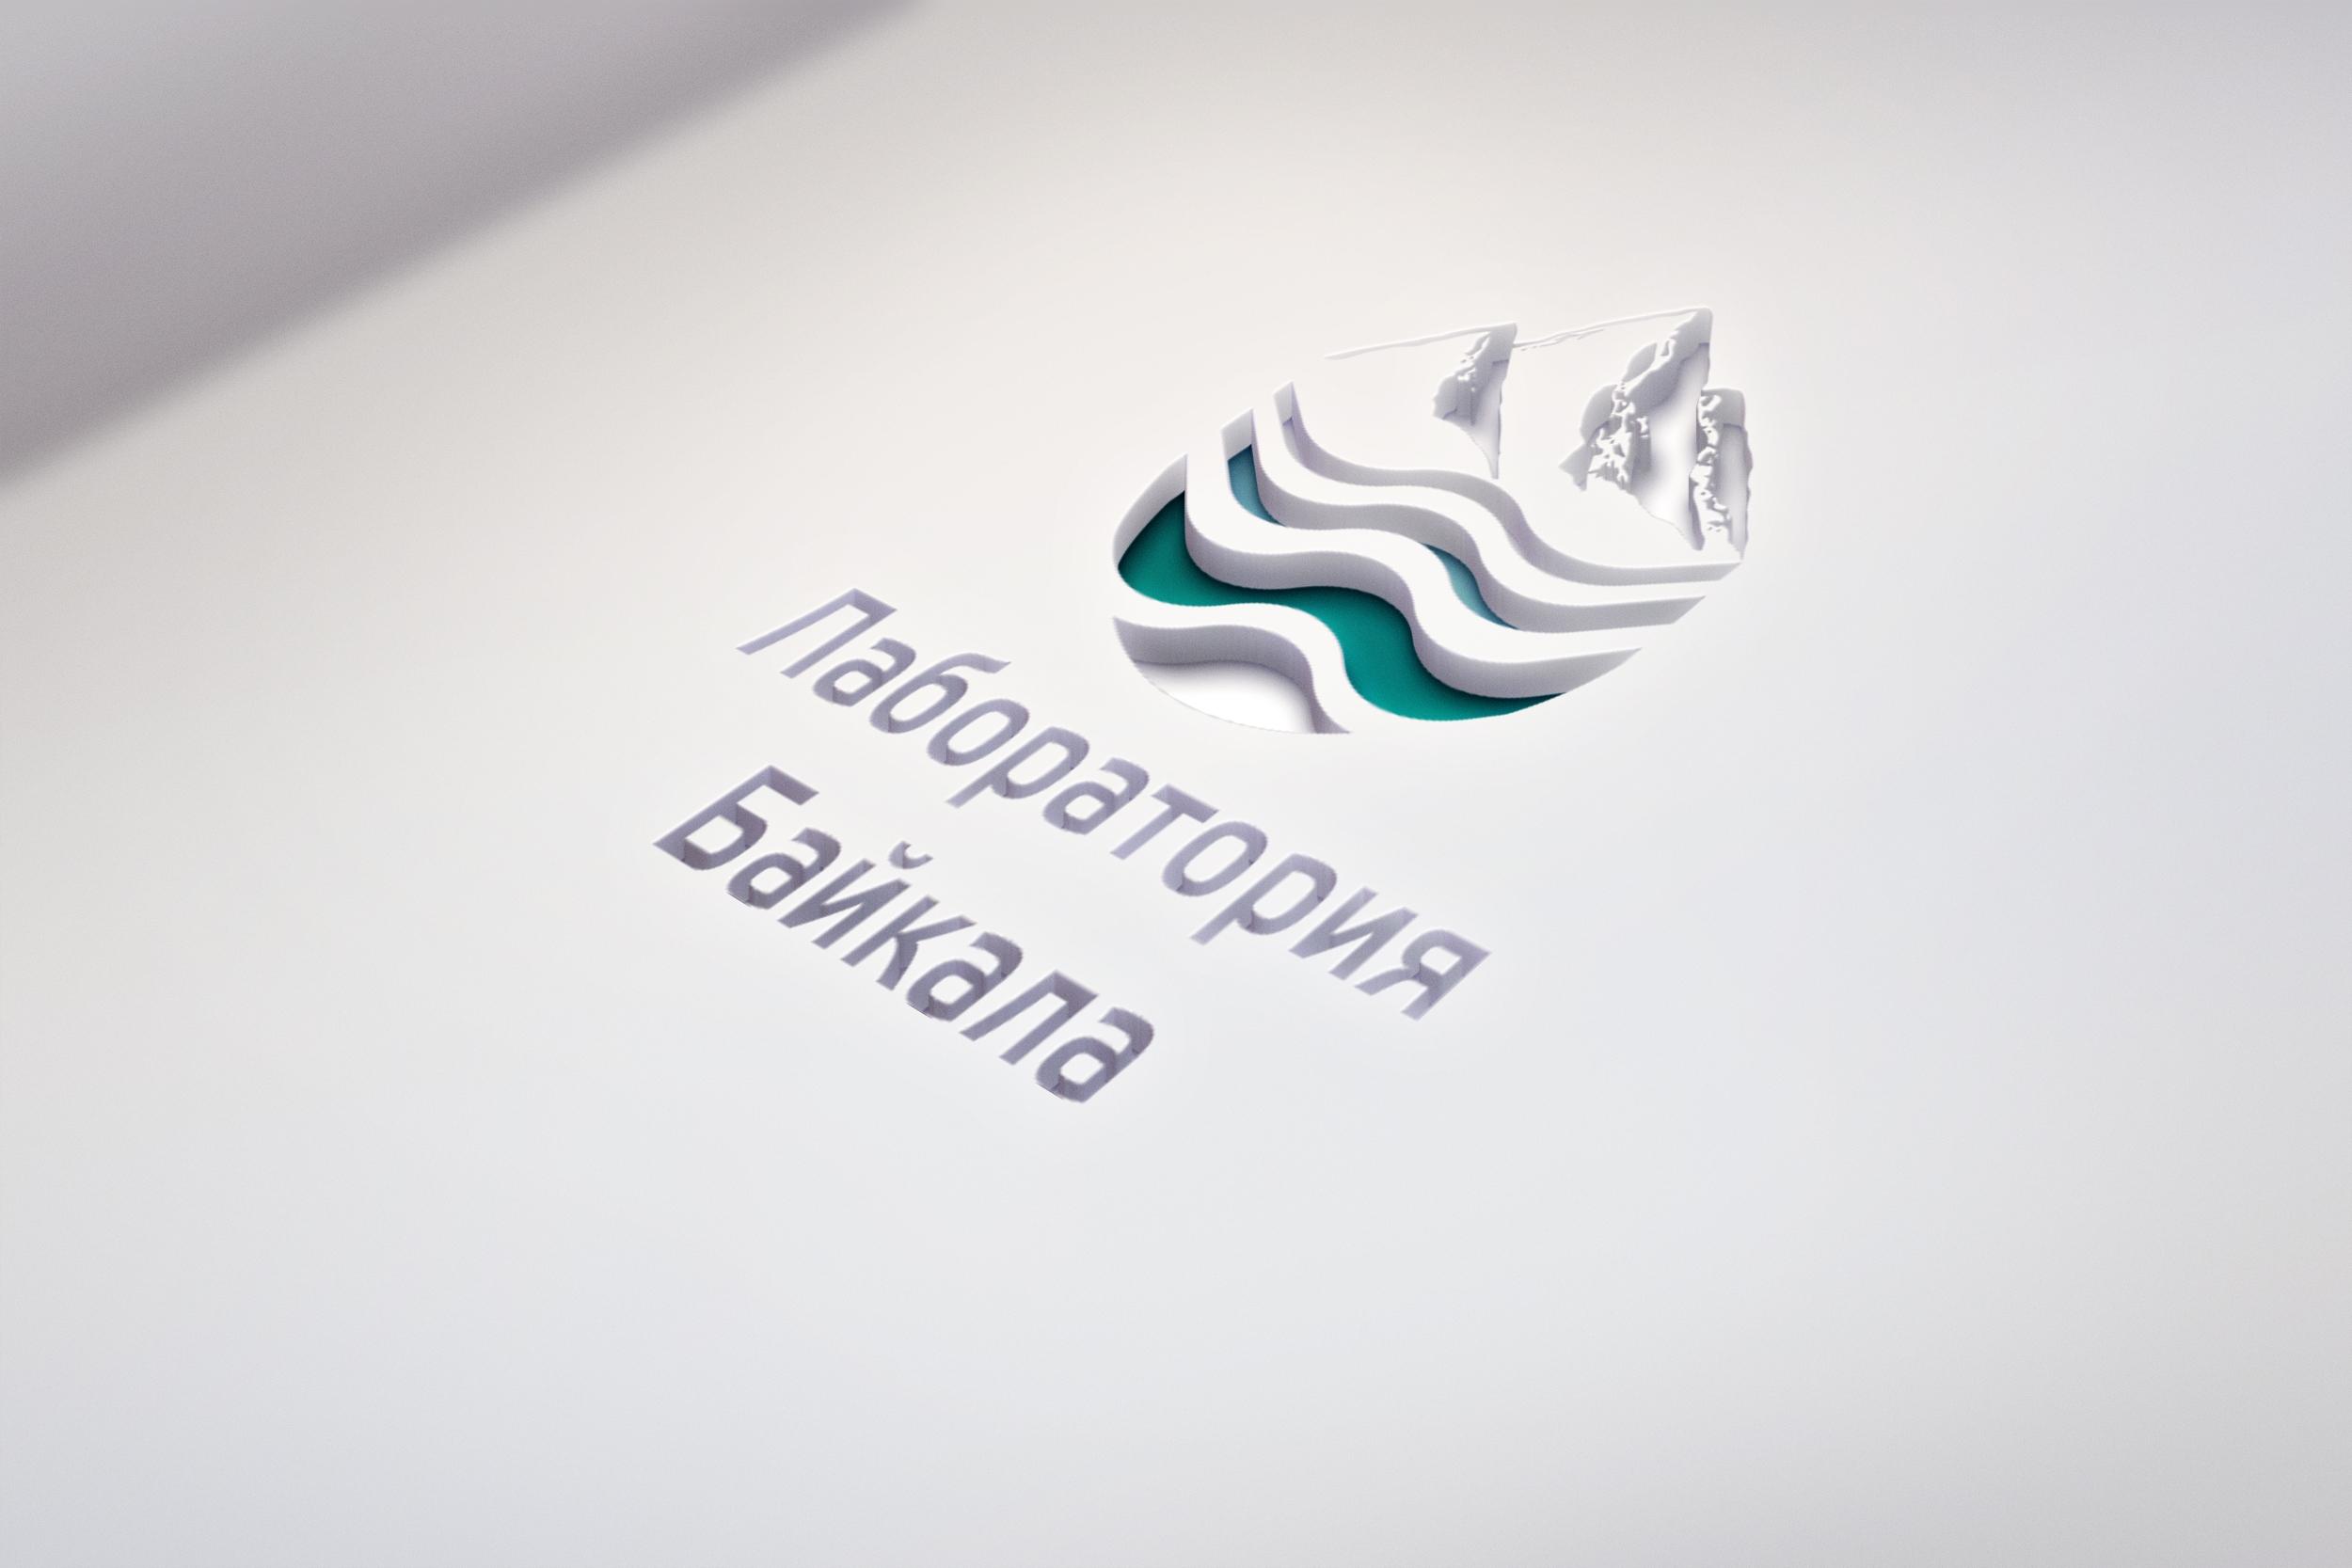 Разработка логотипа торговой марки фото f_7625971b81028fa7.jpg